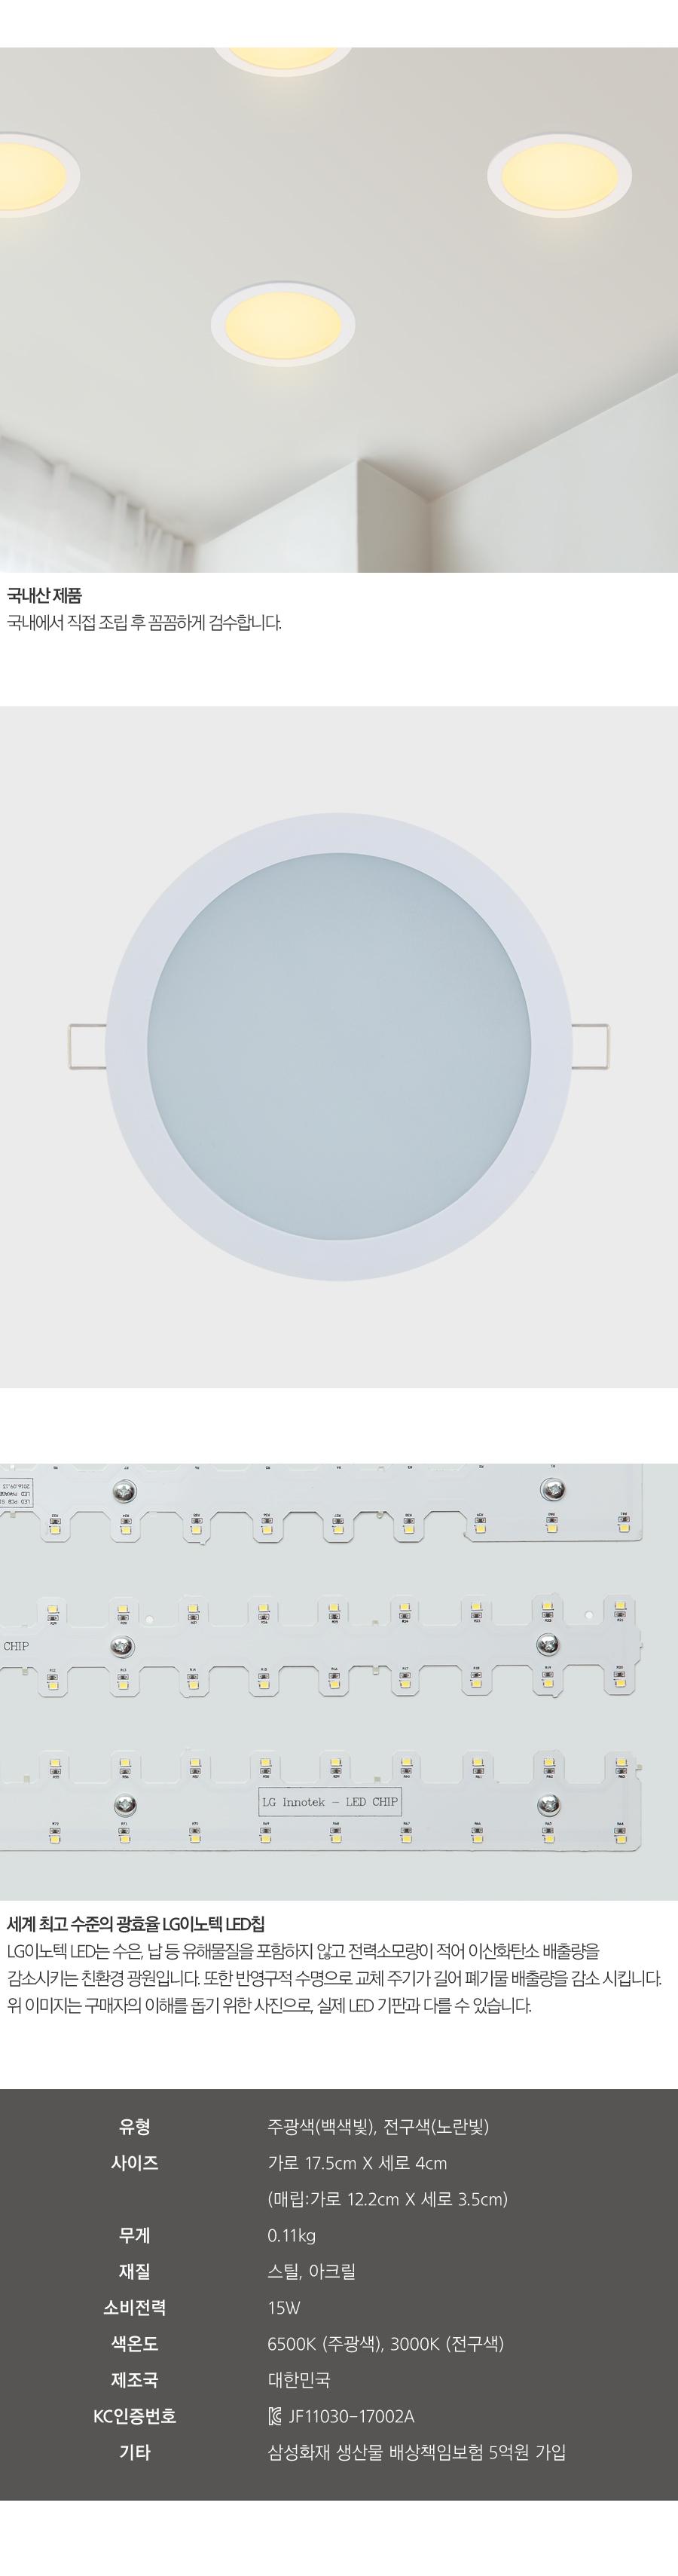 LG이노텍정품 LED 다운라이트 15W 15.24cm [국내산] - 샛별조명, 12,500원, 리빙조명, 방등/천장등